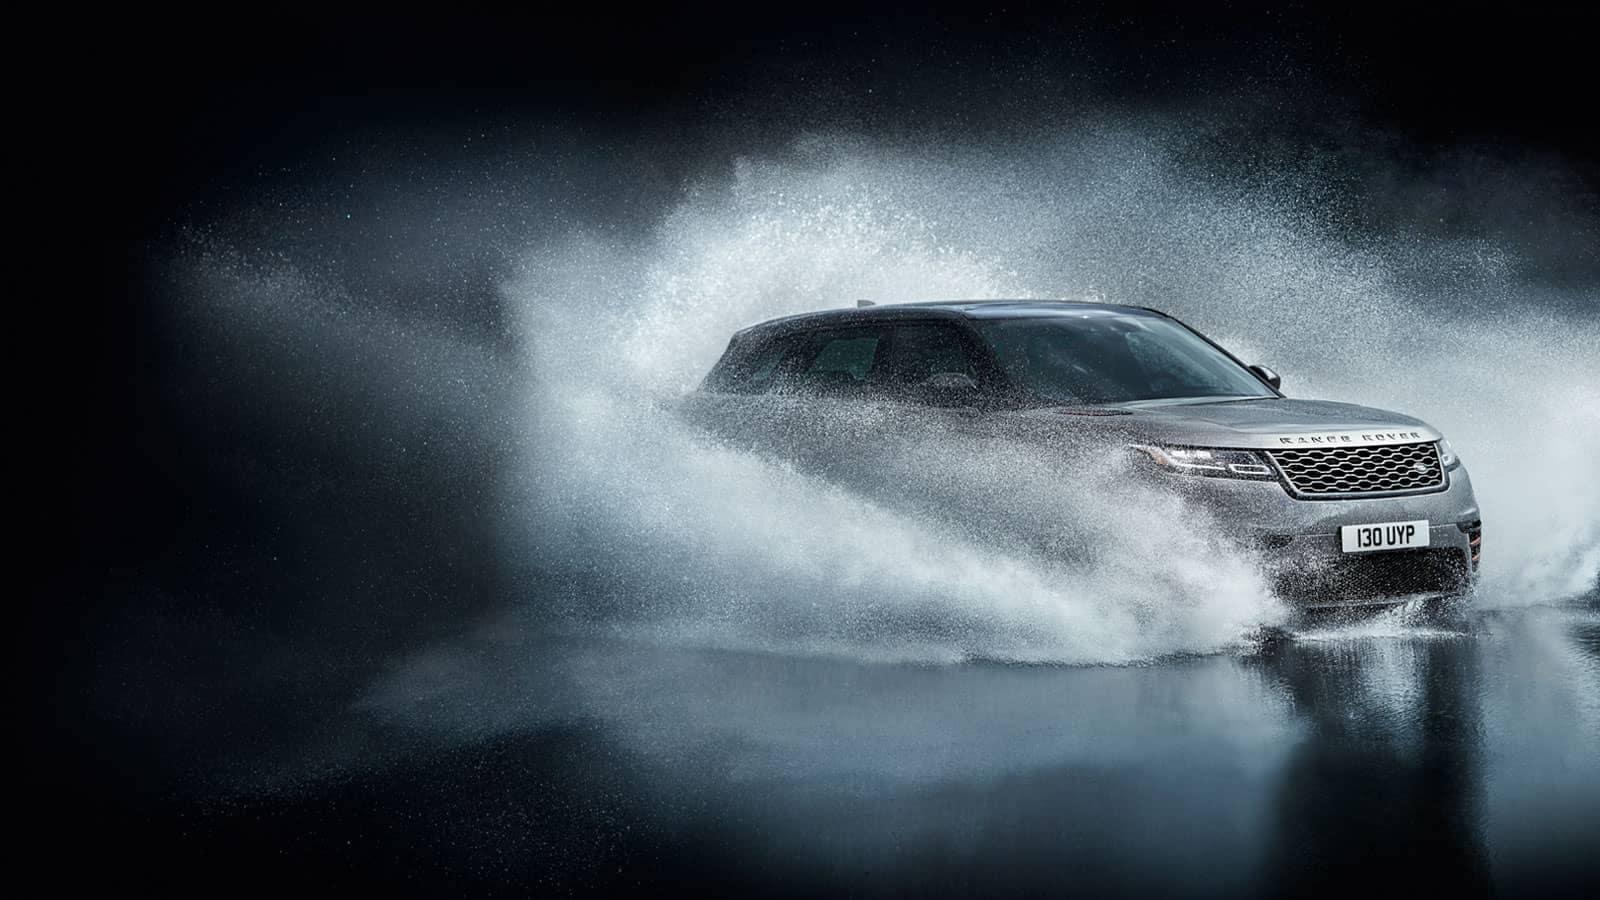 2019 Land Rover Range Rover Velar in water